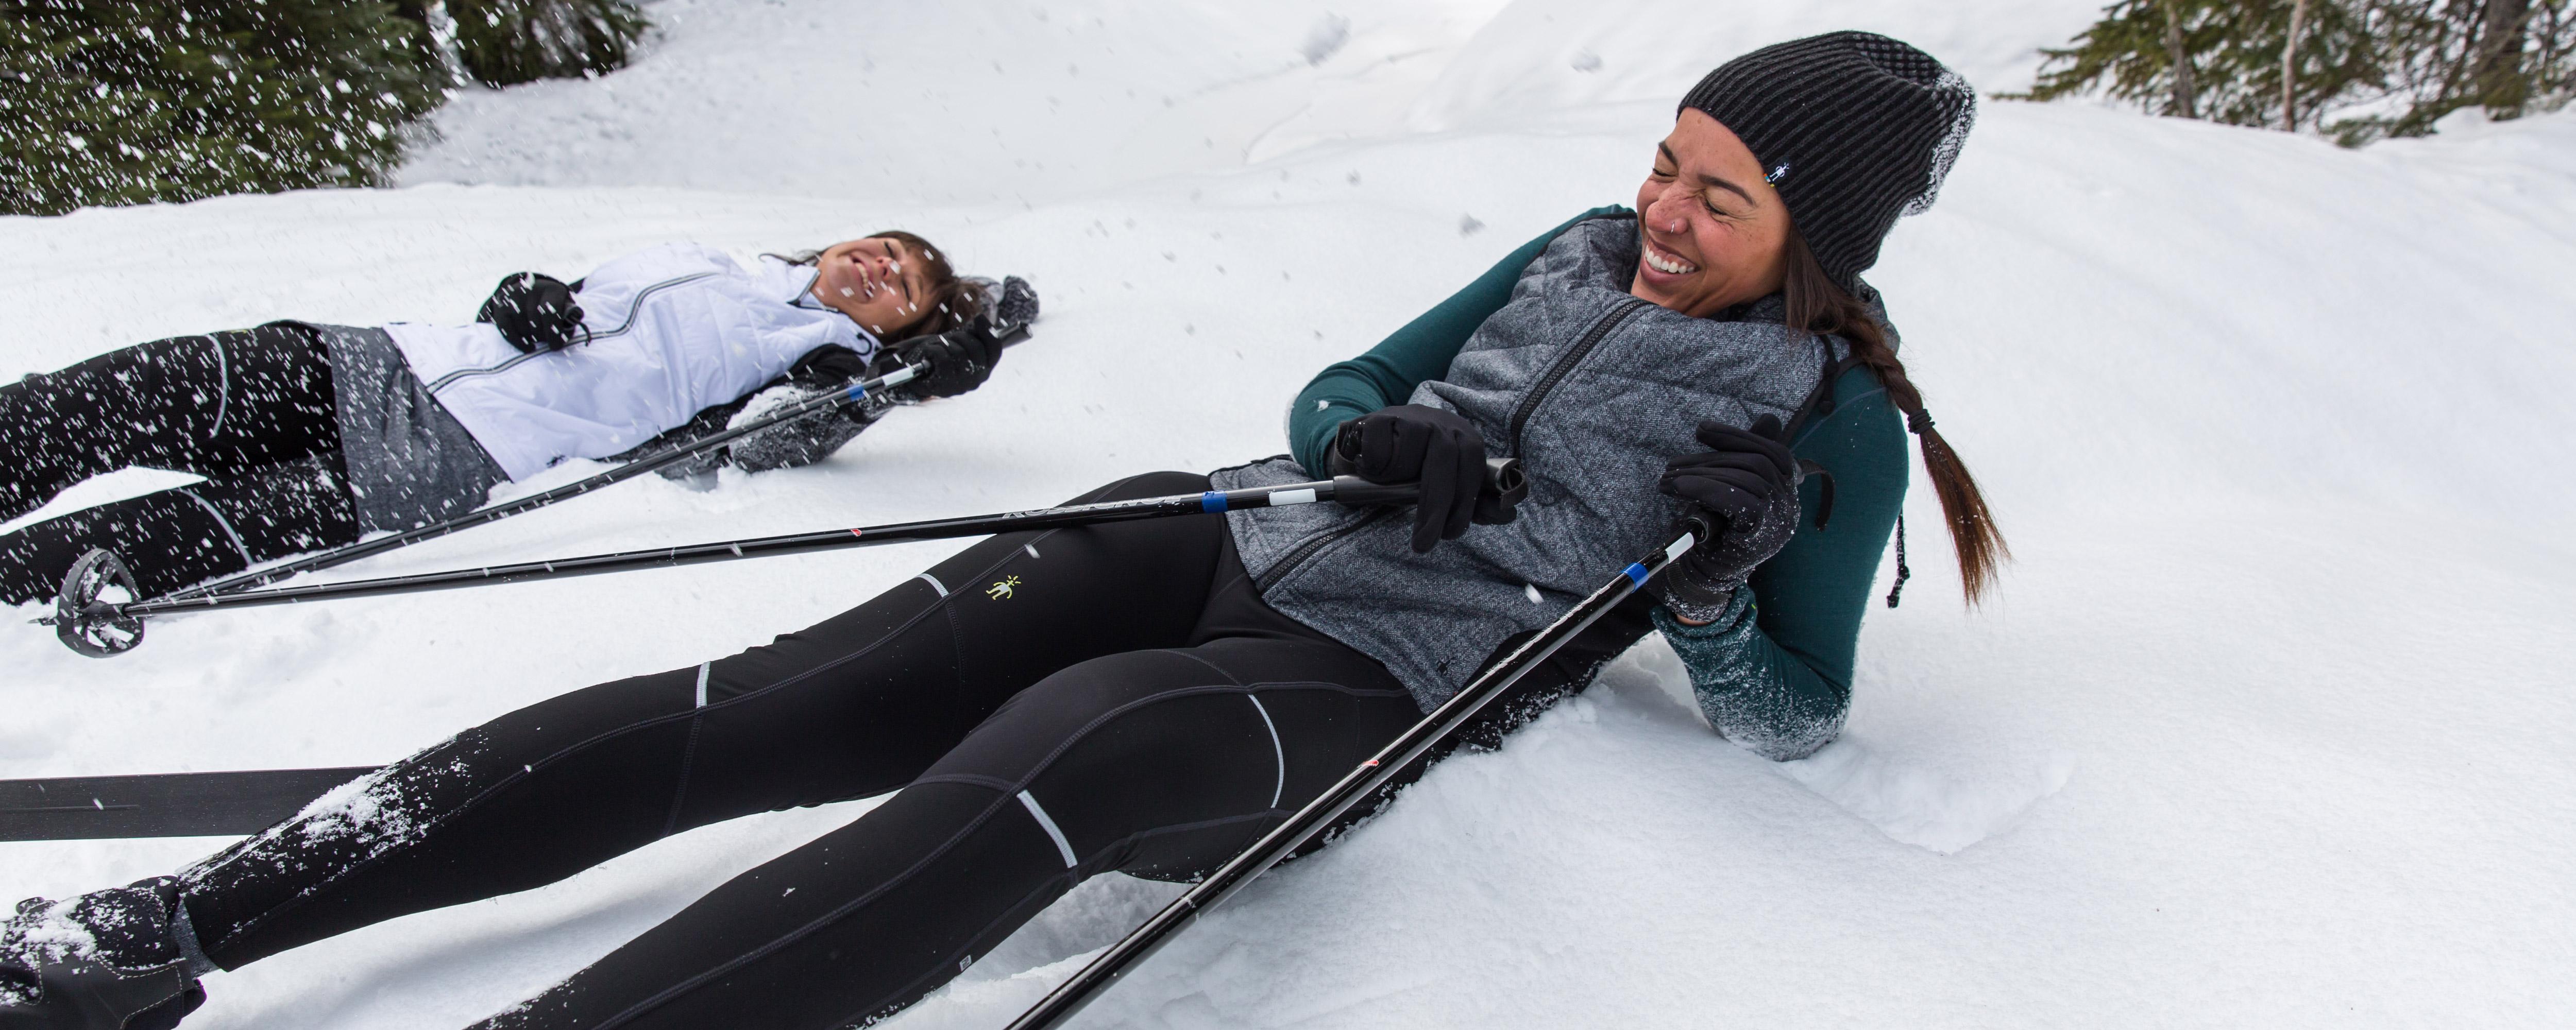 fd78eea0897aa Magasiner sports d'hiver - Équipement, Vêtements et Accessoires   MEC